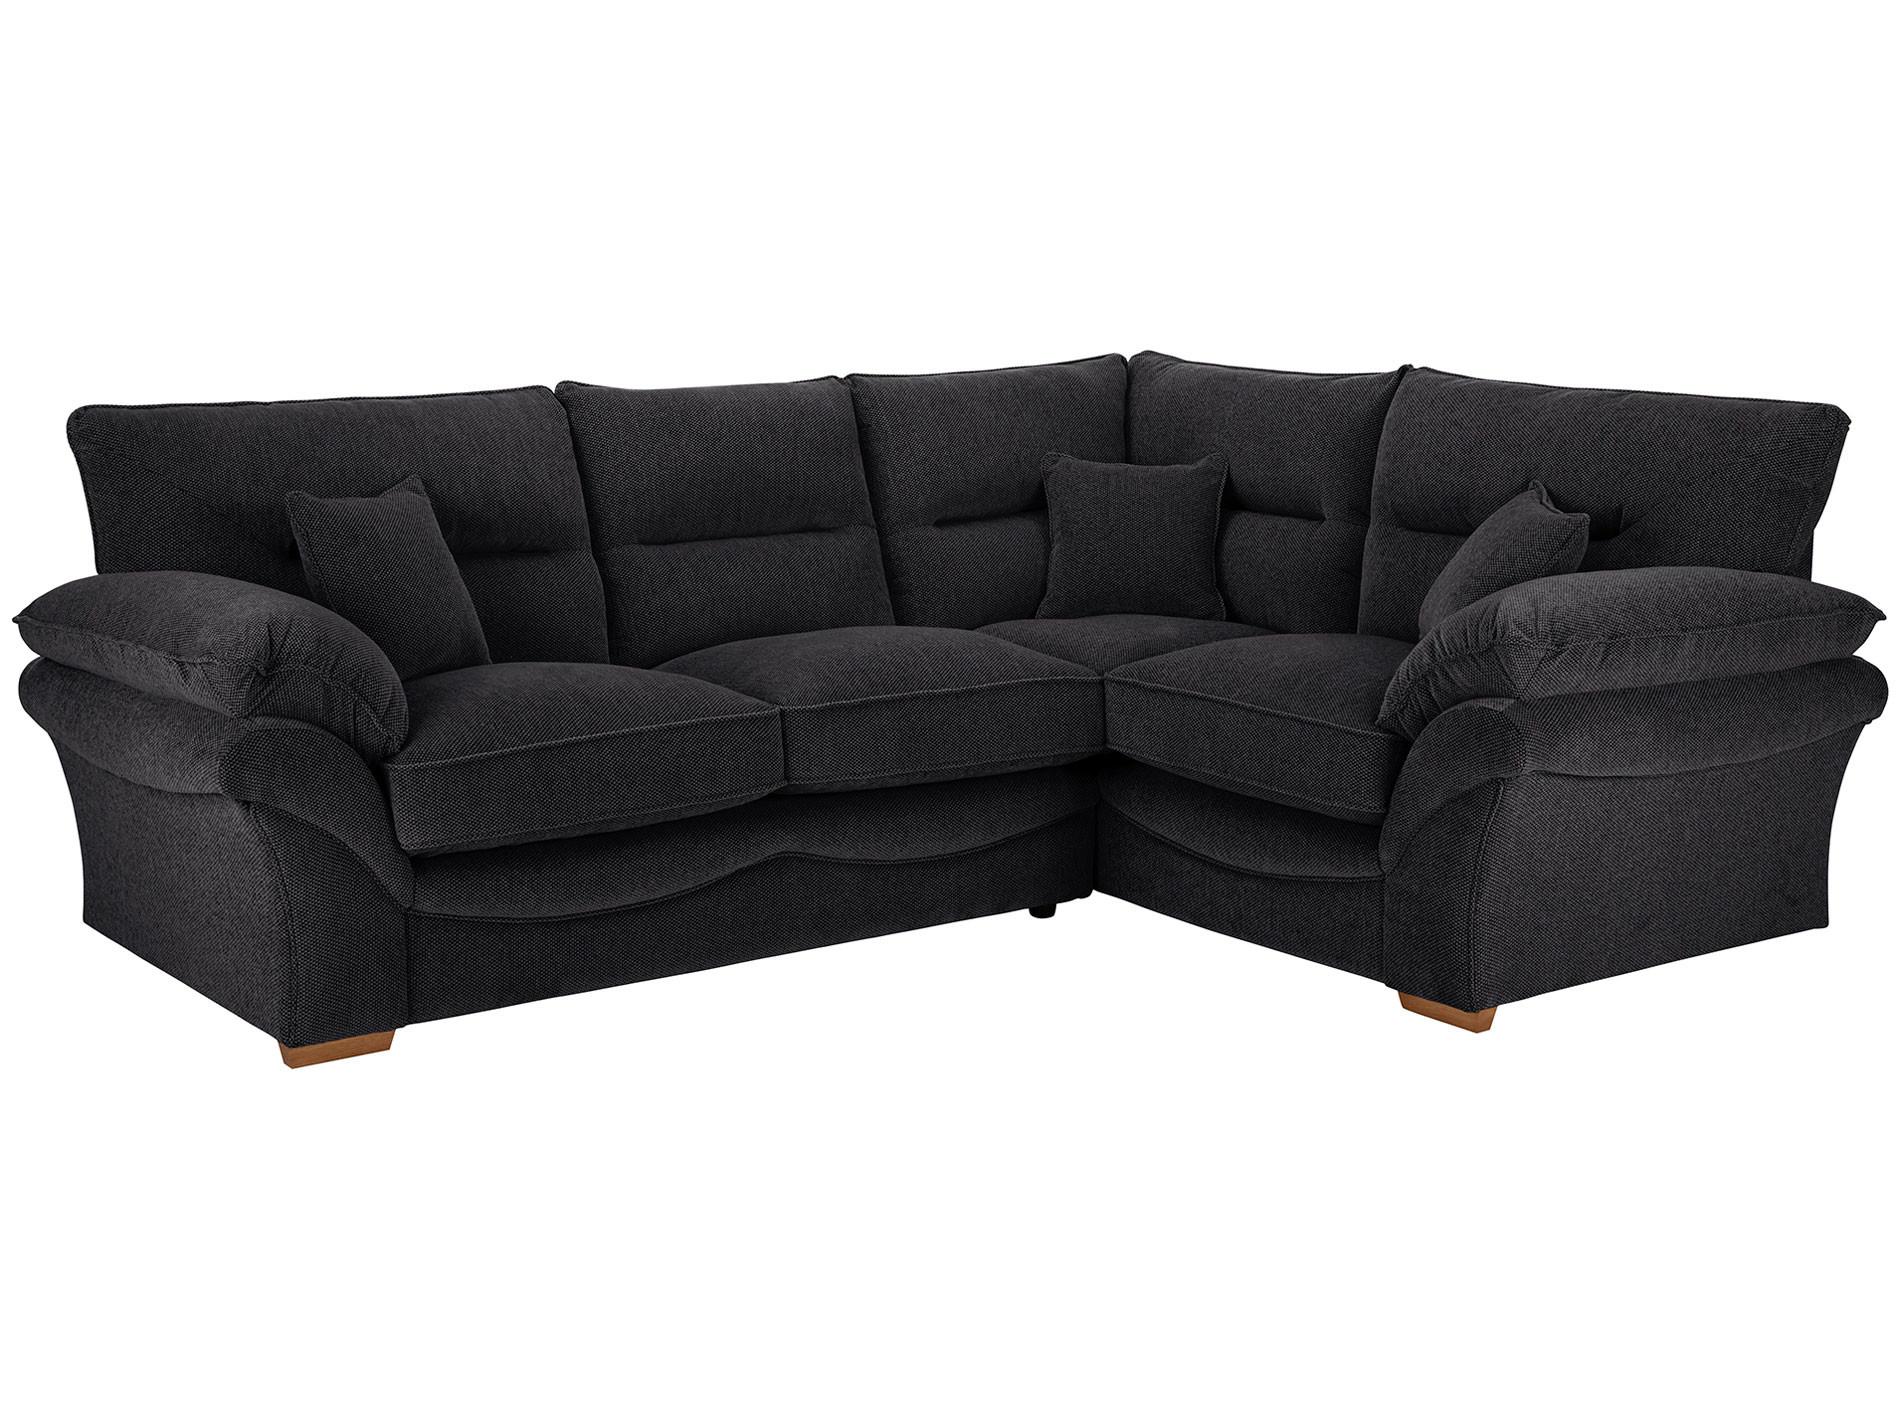 black fabric corner sofa bed lipat chloe right hand in logan